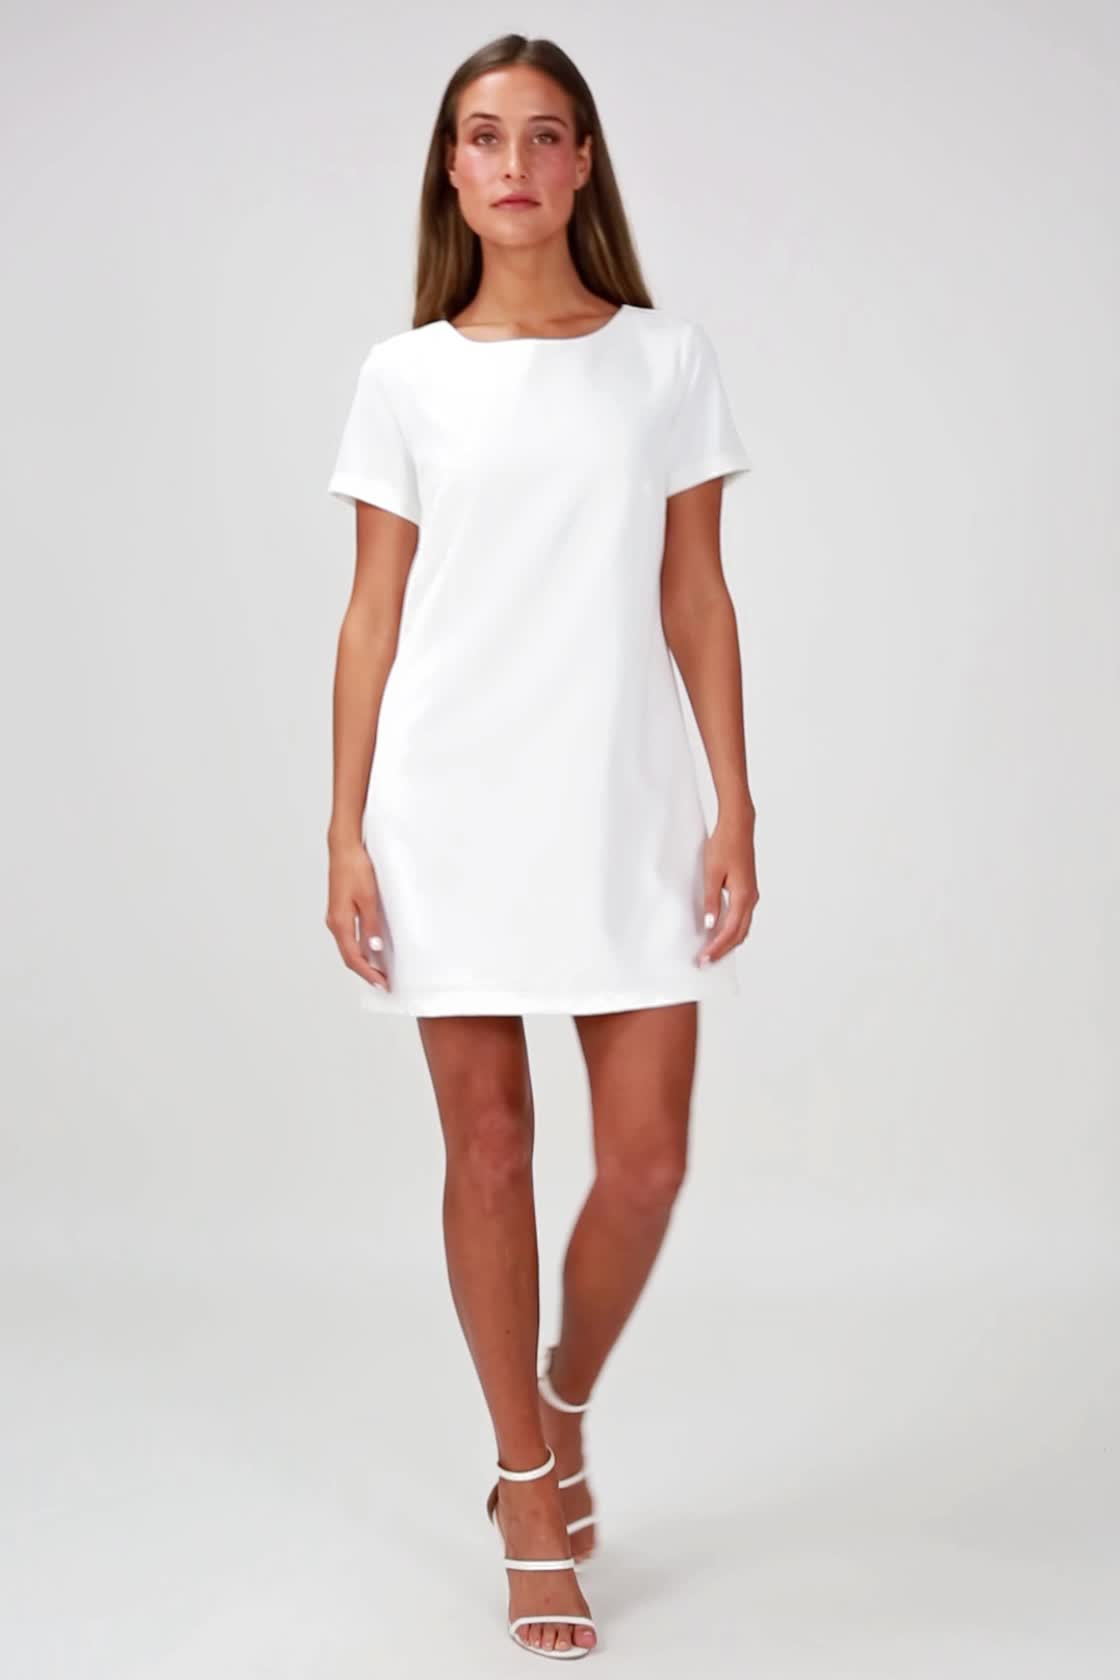 1c752d53fa73 Blush Pink Dress - Shift Dress - Short Sleeve Dress -  49.00